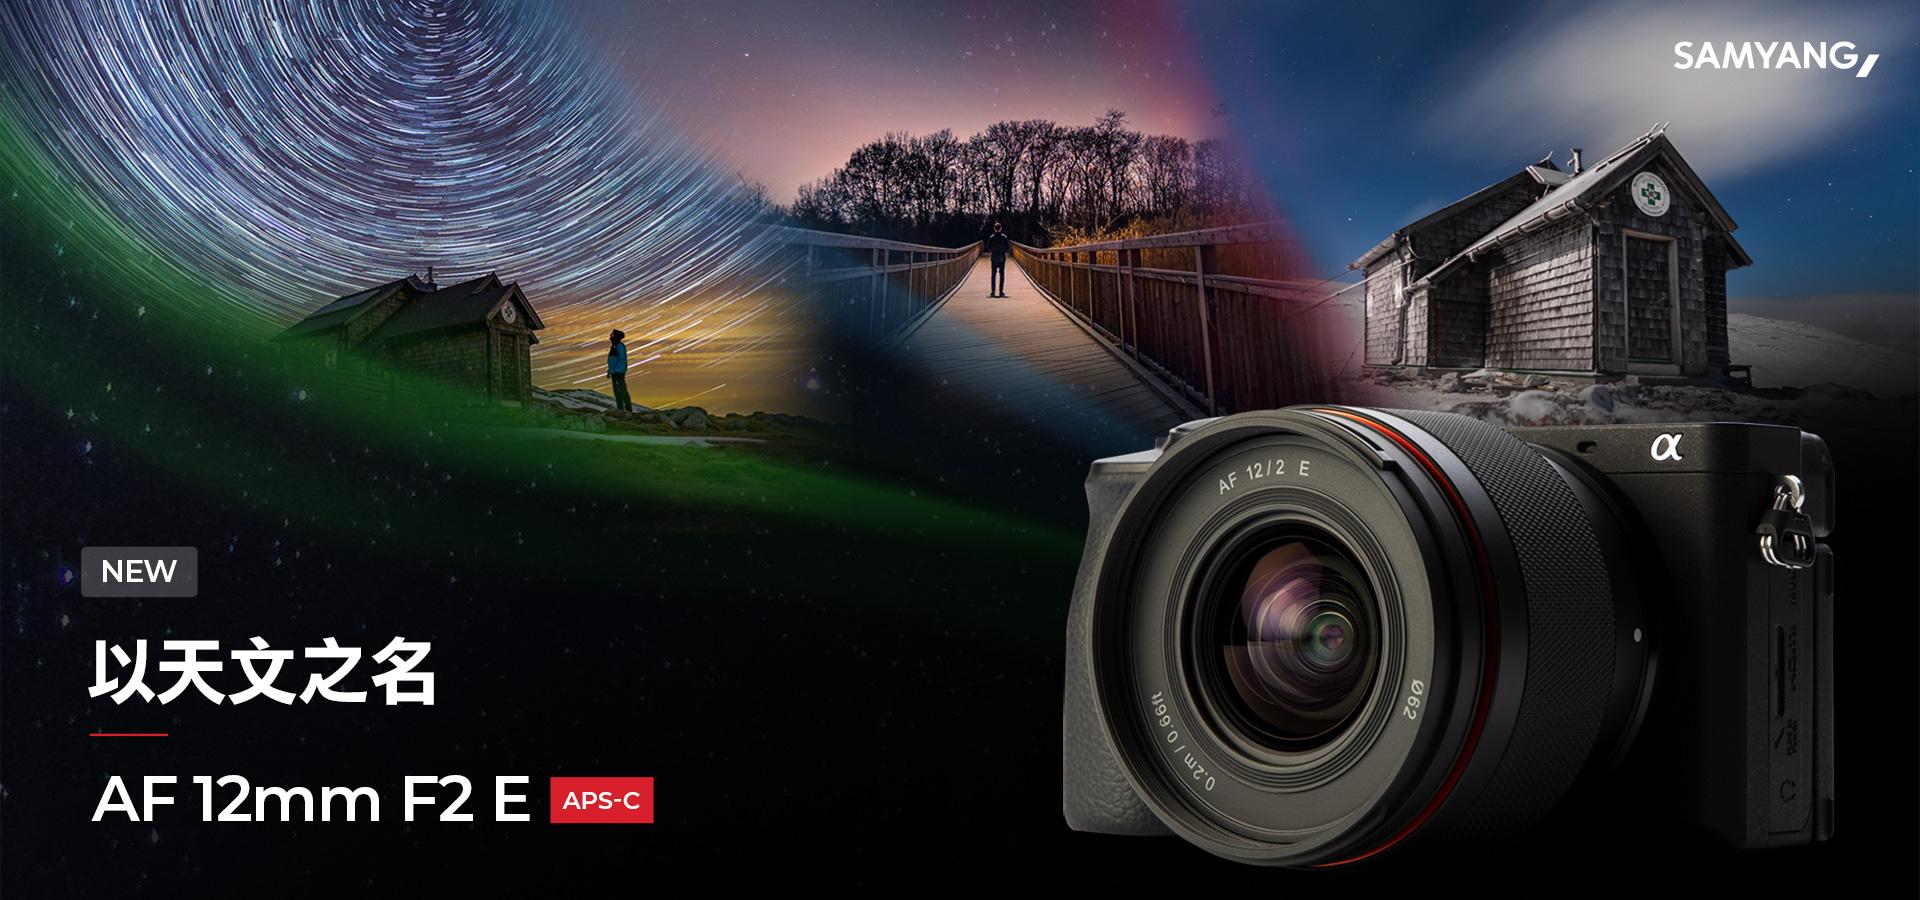 【中野數位】Samyang  AF 12mm F2 E-MOUNT--SONY全新鏡頭新登場天文鏡/公司貨